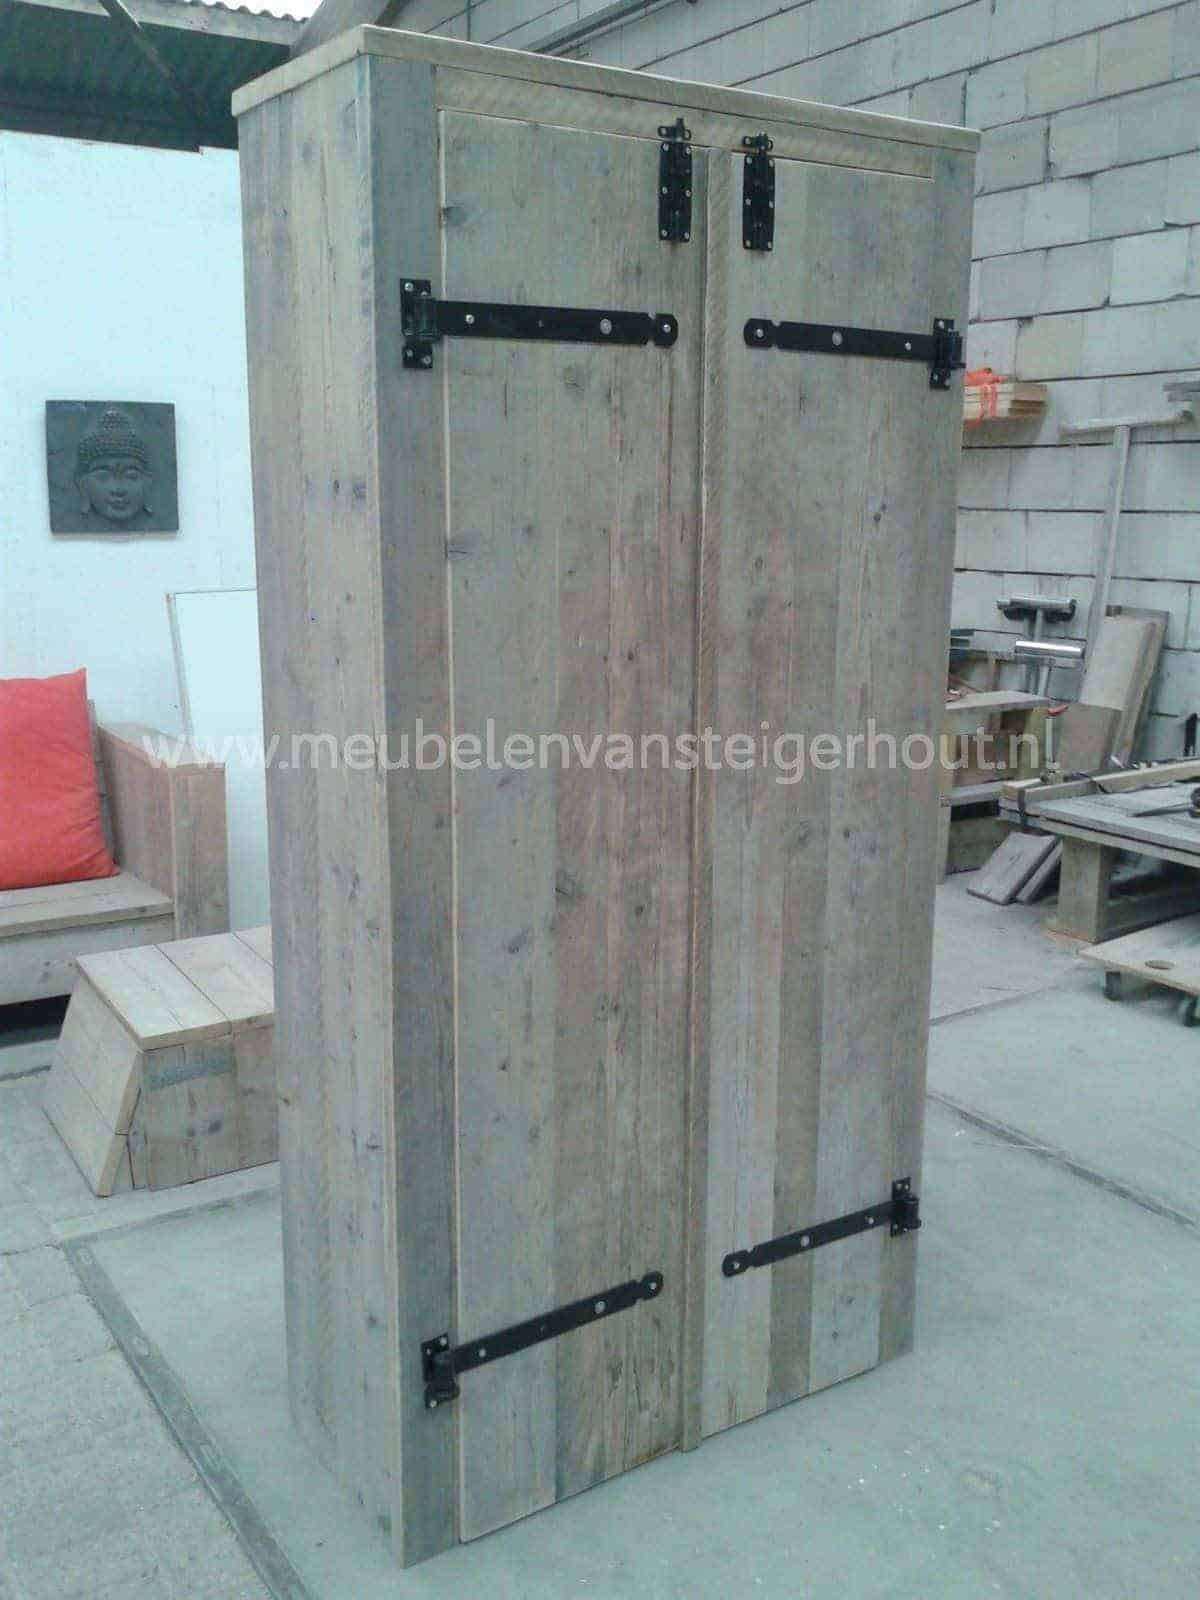 kledingkast sam meubelen van steigerhout